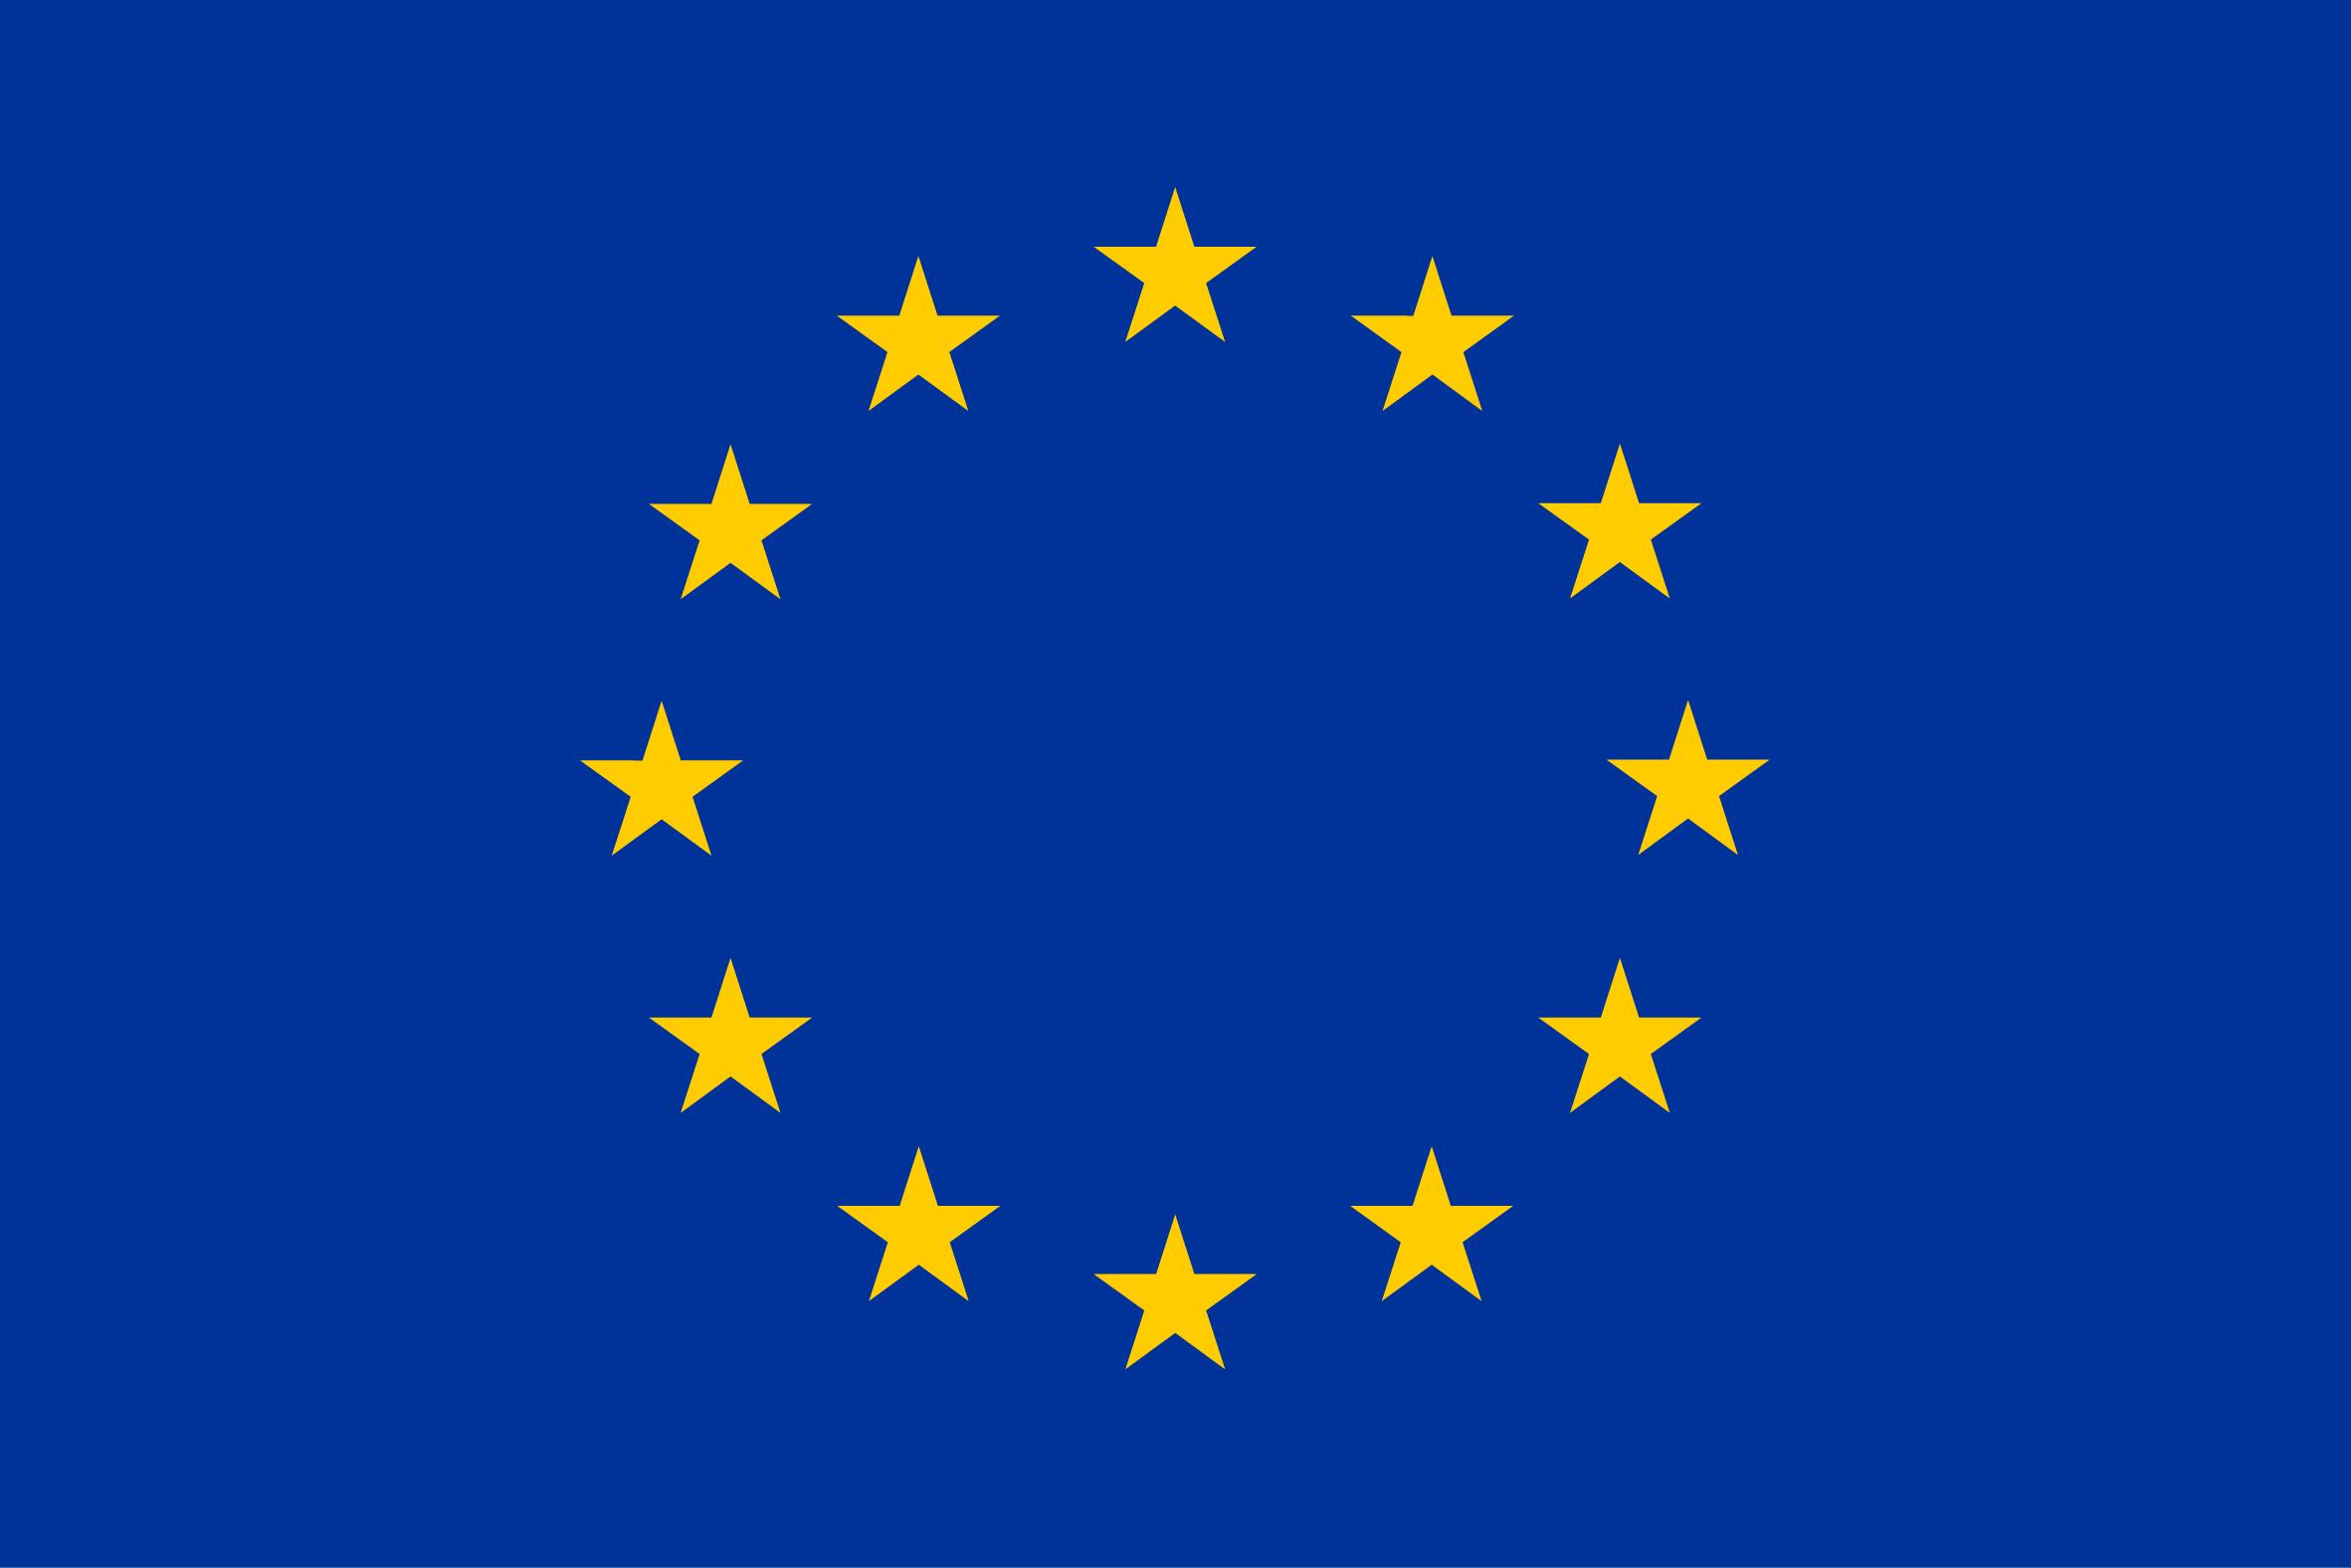 UE roaming